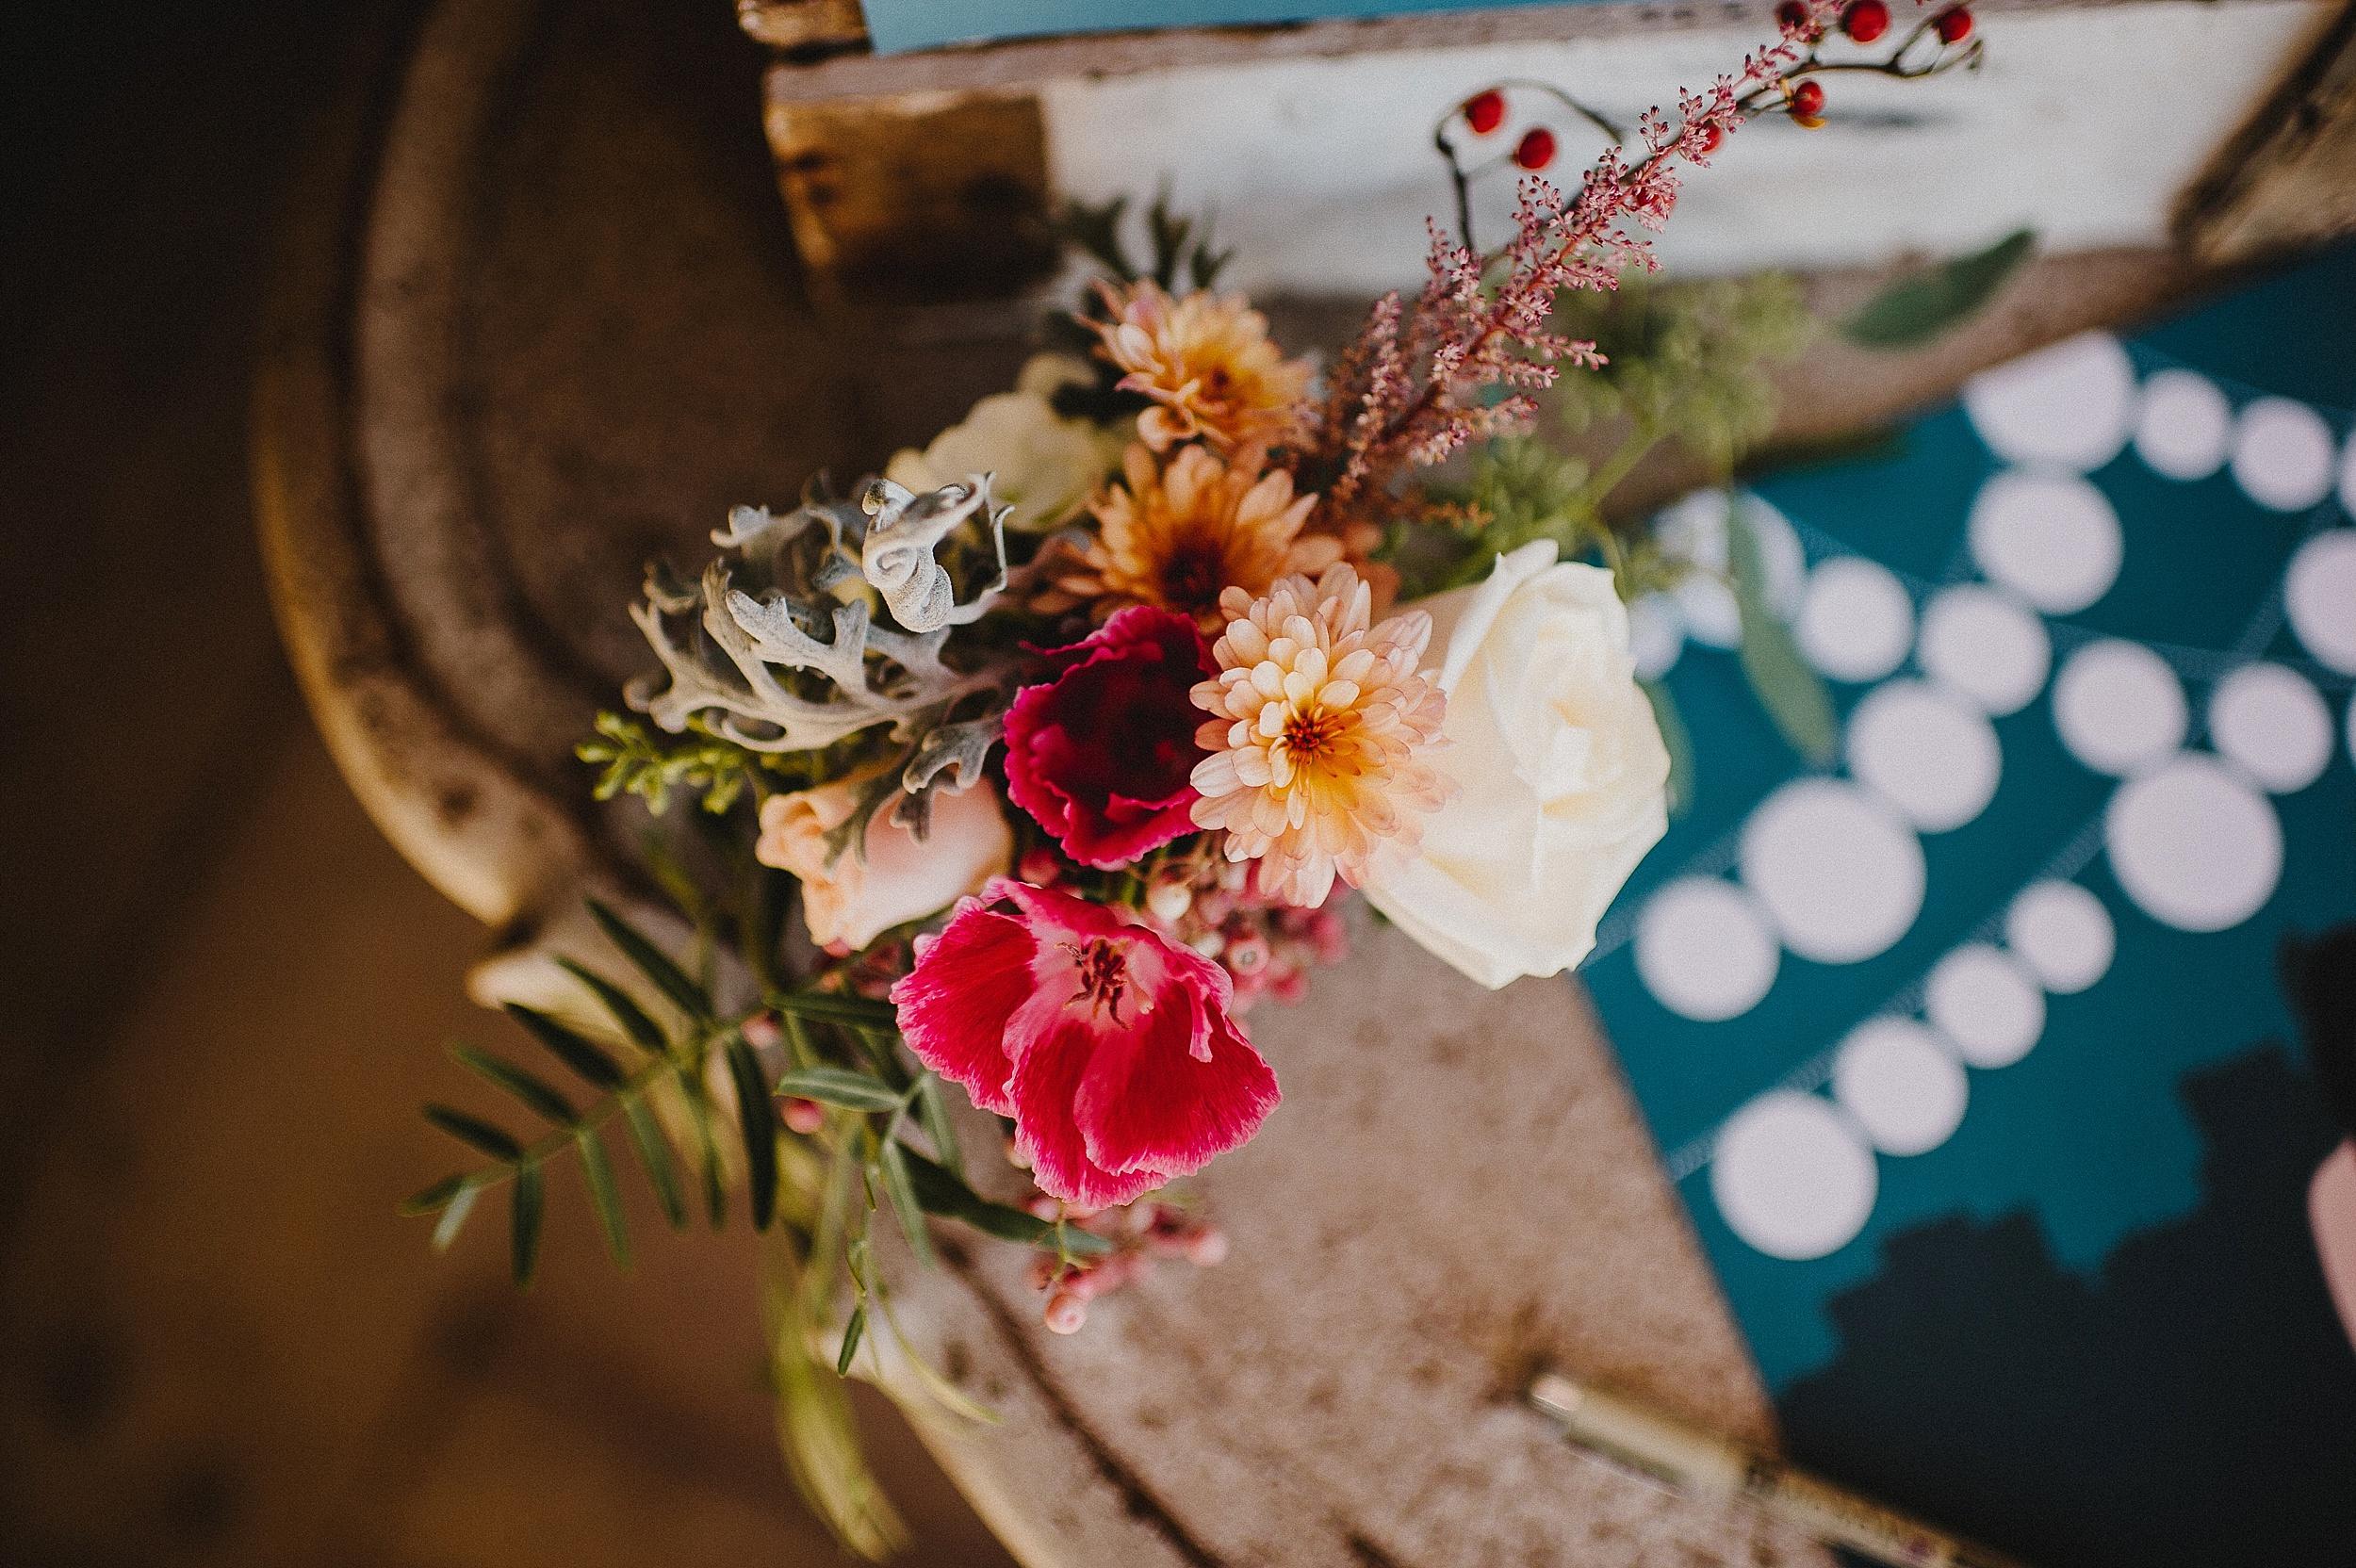 terrain-at-styers-wedding-photography-6.jpg